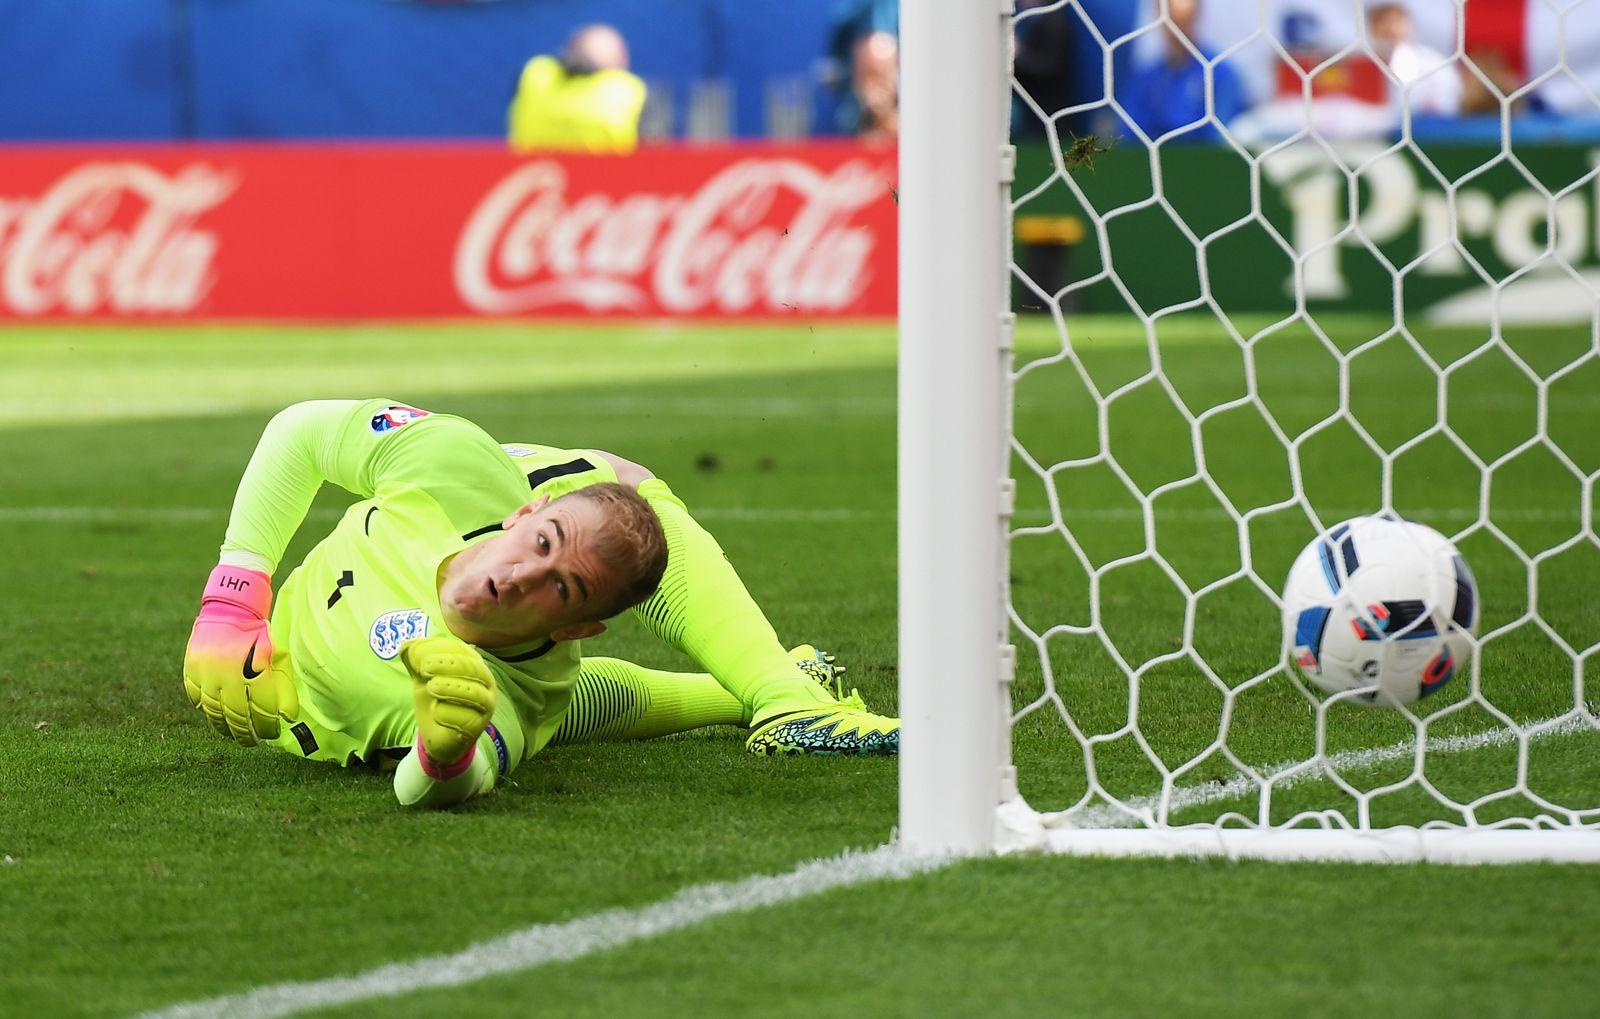 EURO 2016 / Lens / England / Wales